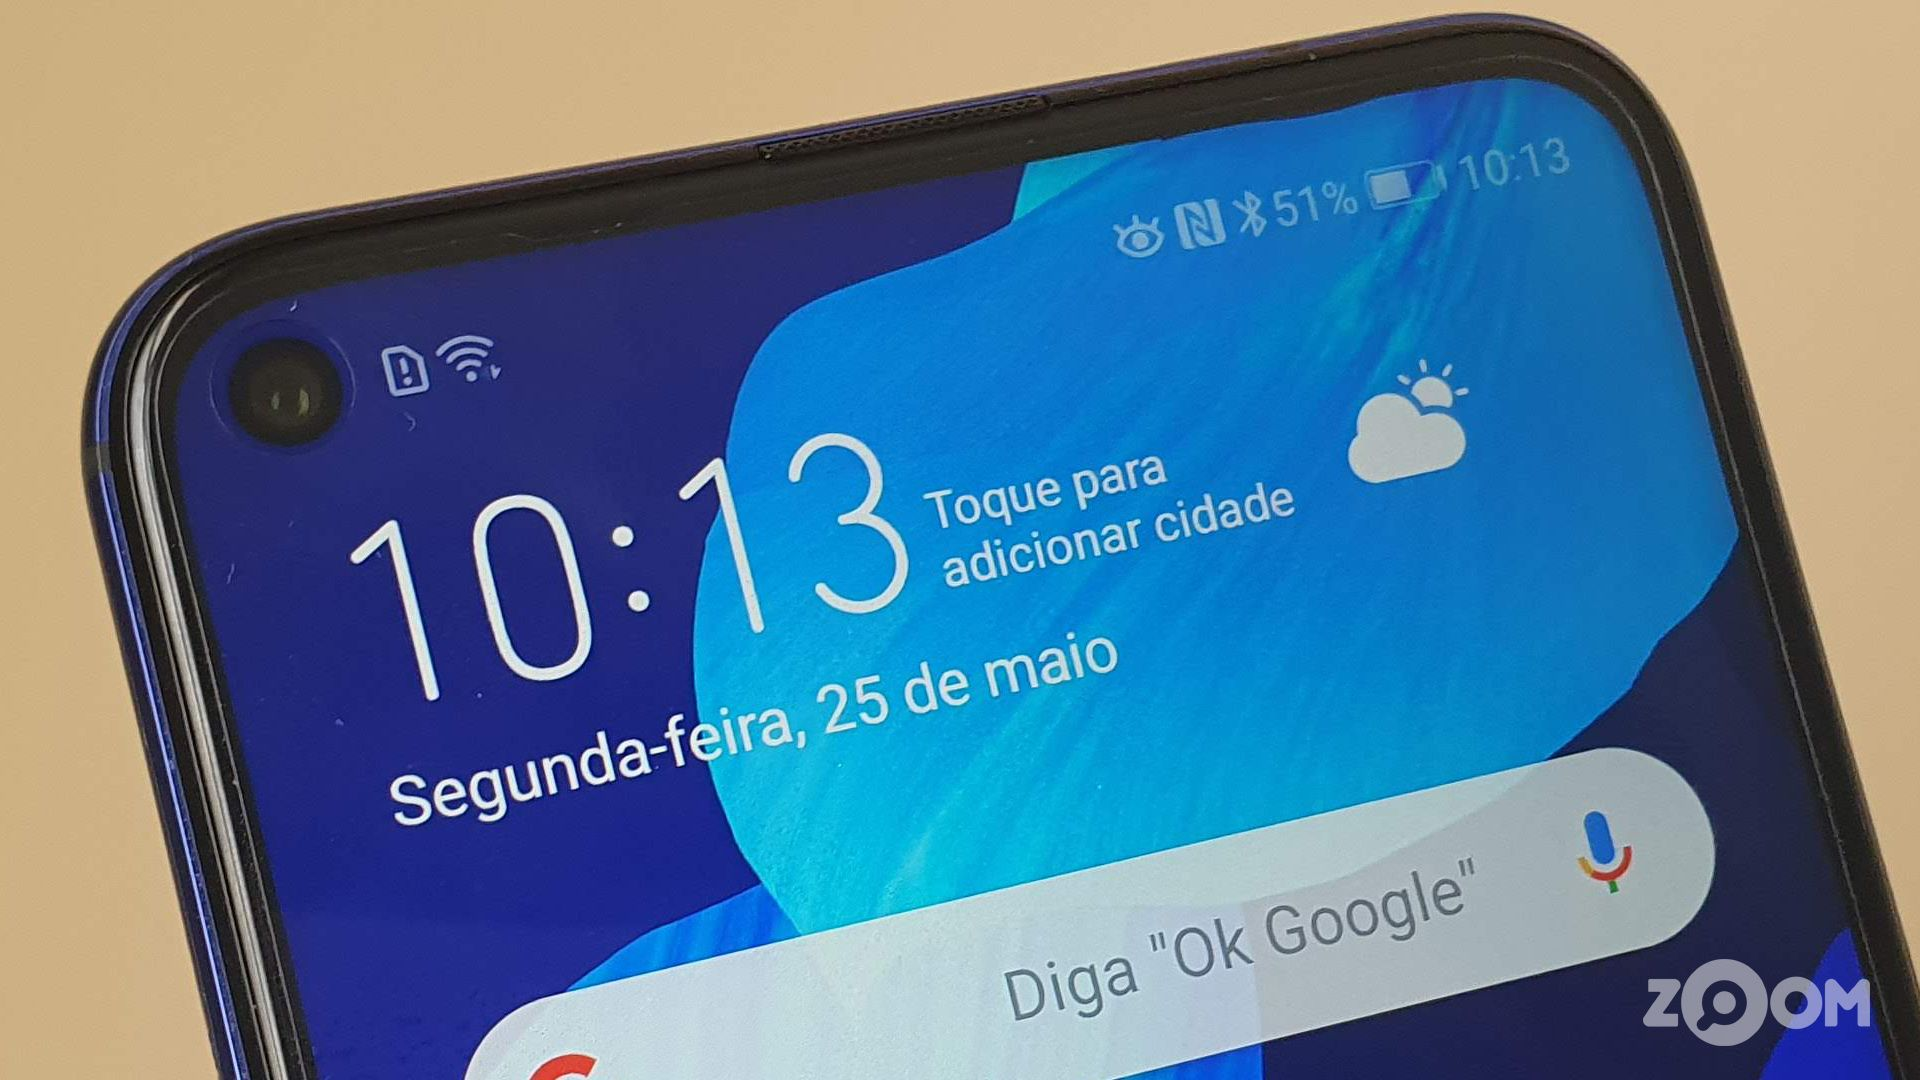 Câmera frontal do Huawei nova 5T tem 32 megapixels. (Imagem: Ana Marques/Zoom)